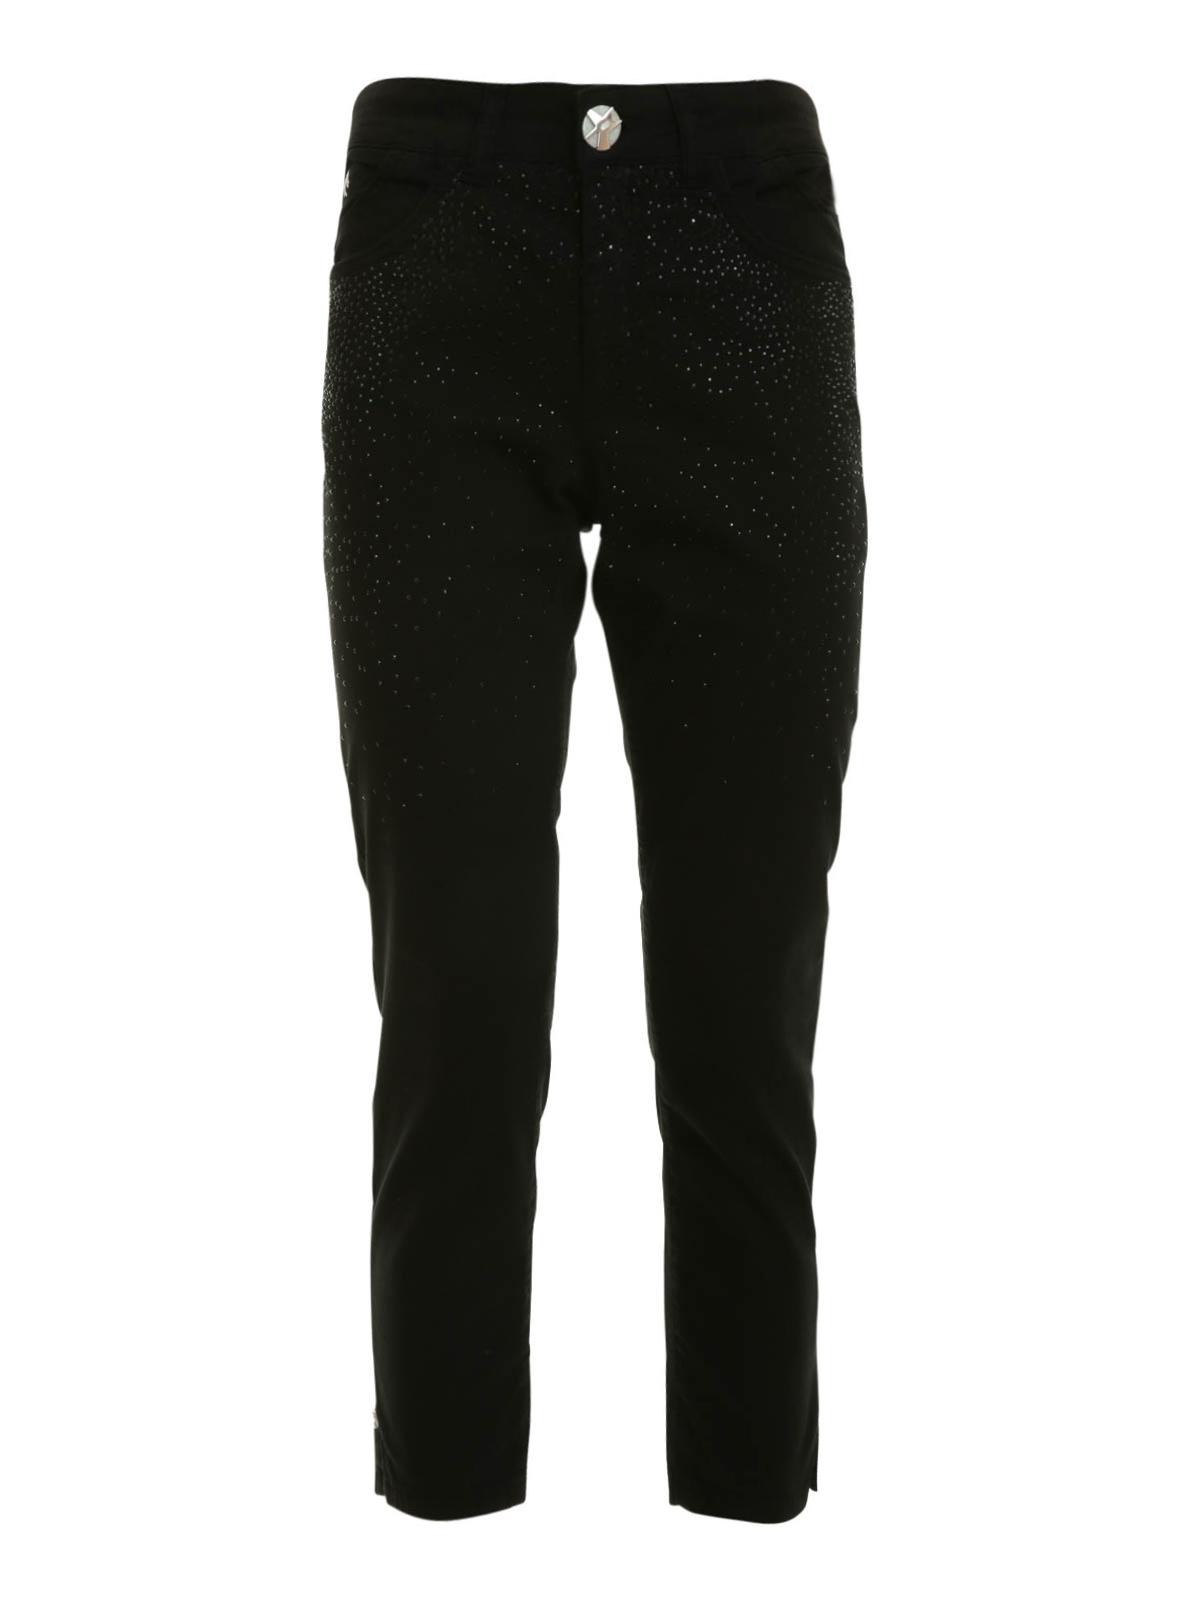 jeans studs